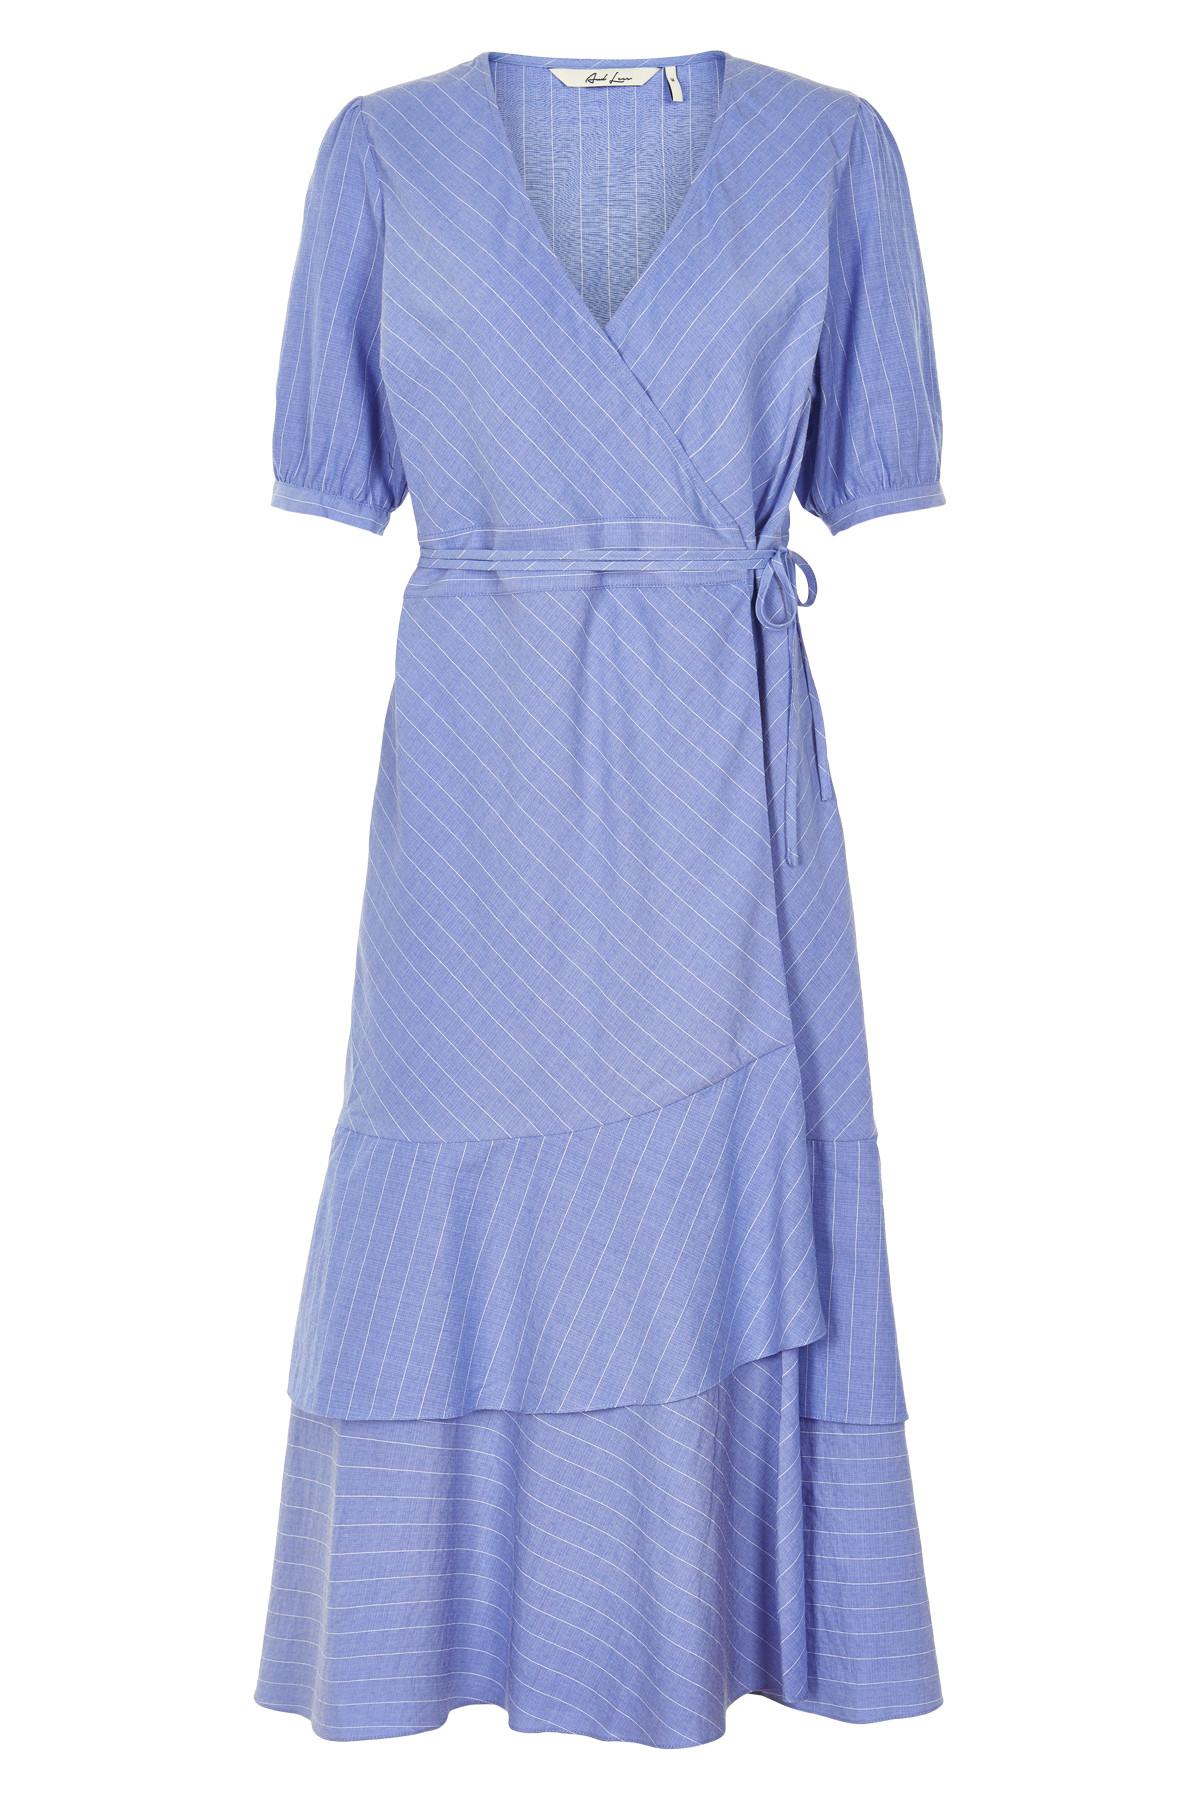 Image of   AND LESS PIOLAA KJOLE 5219803 (Blue Stripe, 34)